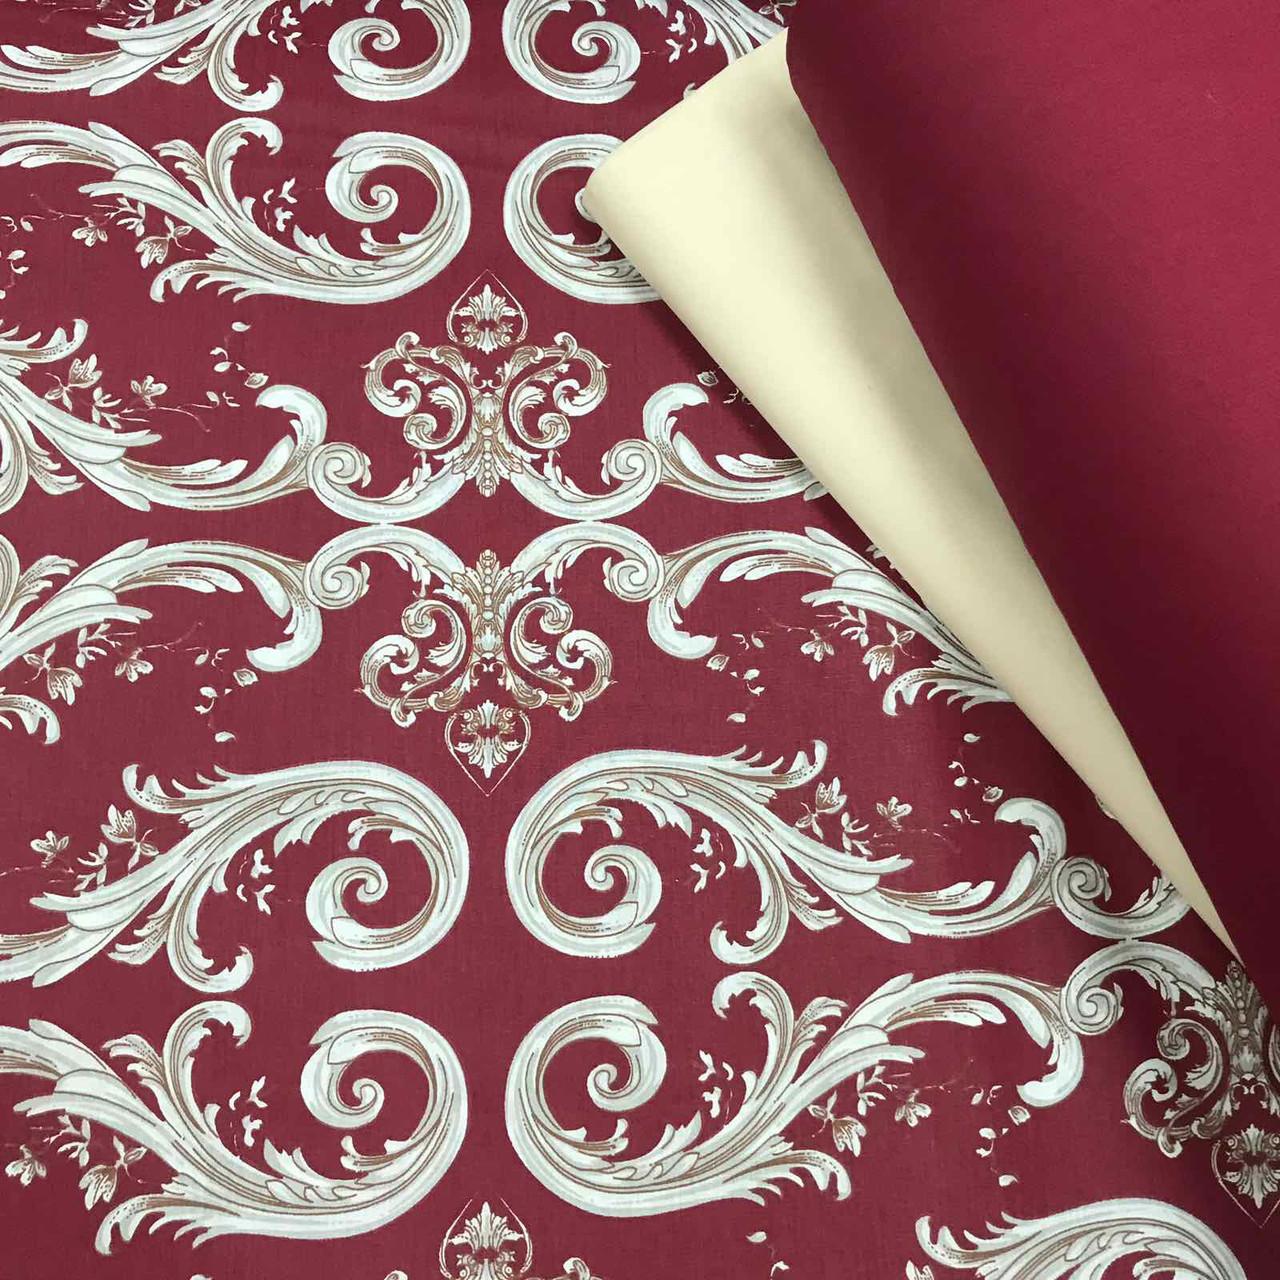 Ткань поплин (ТУРЦИЯ шир. 2,4 м) орнамент бело-бежевый на бордовом